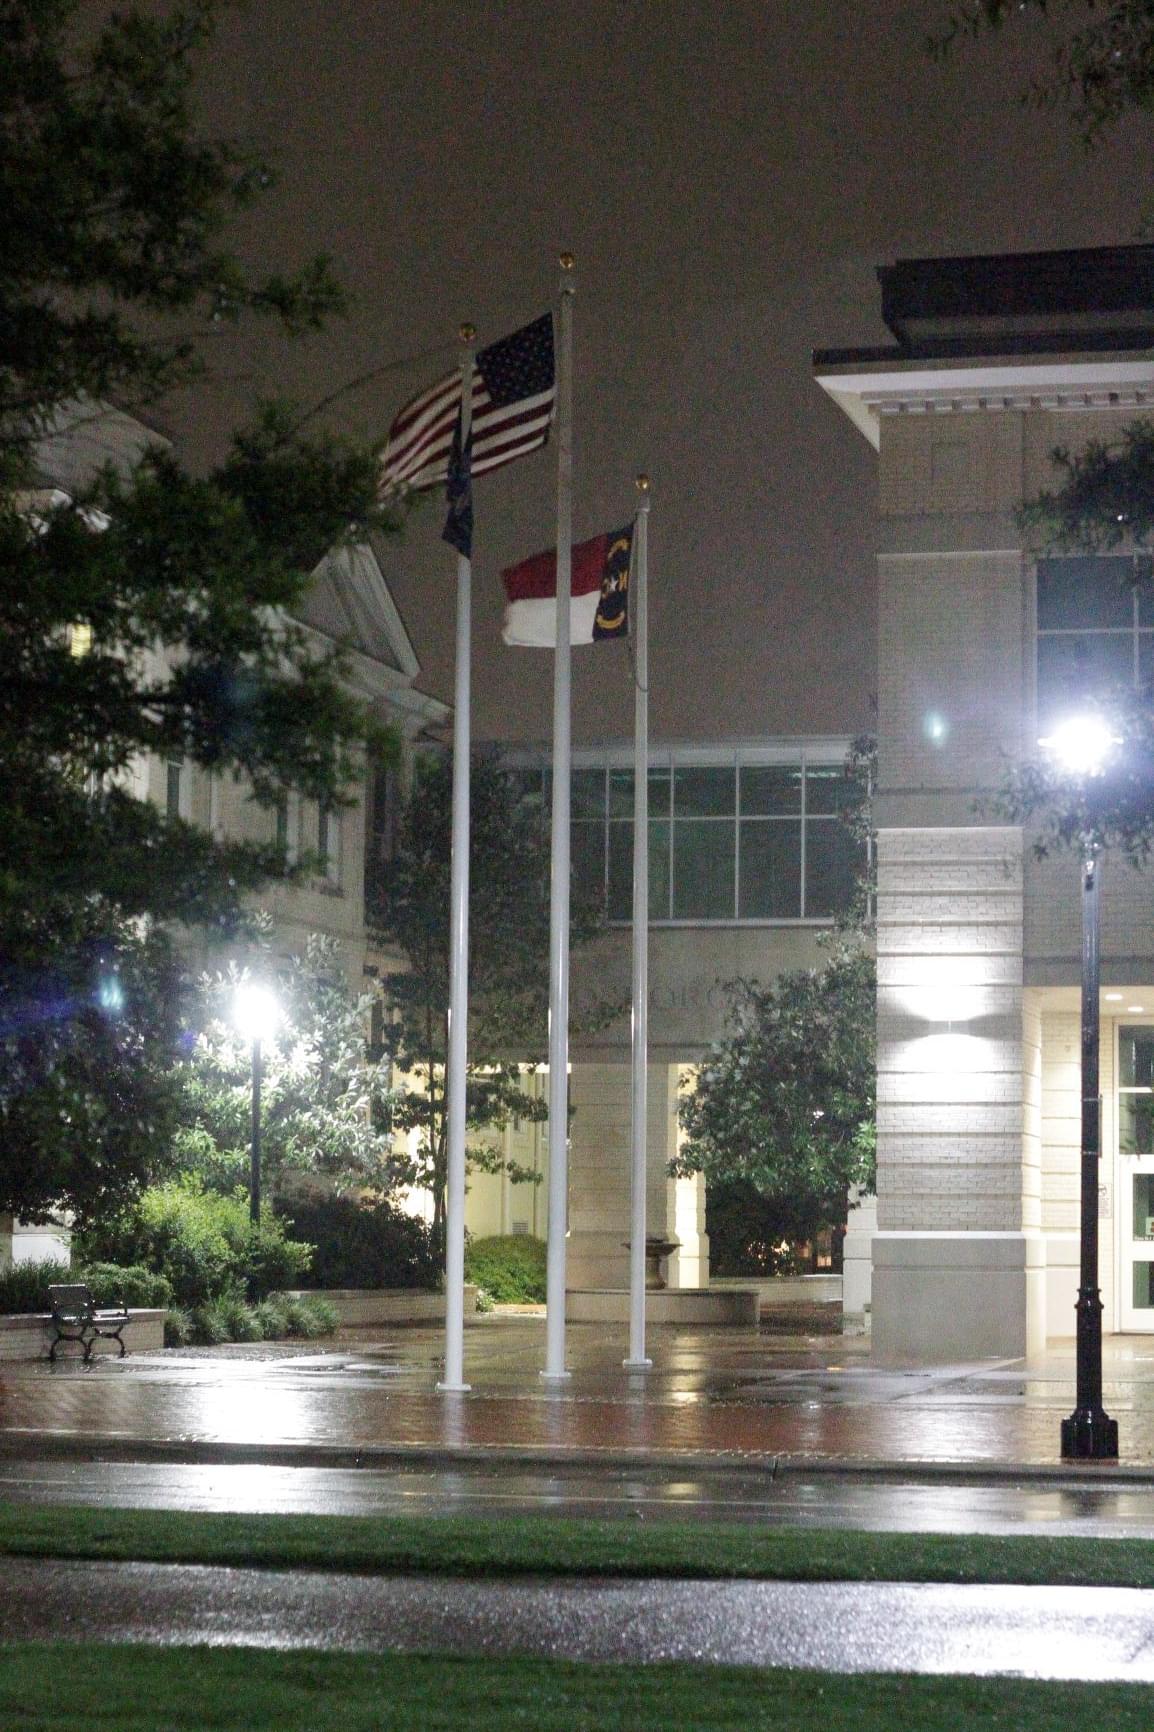 Wayne County Avoids Worst Of Isaias (PHOTOS & VIDEO)